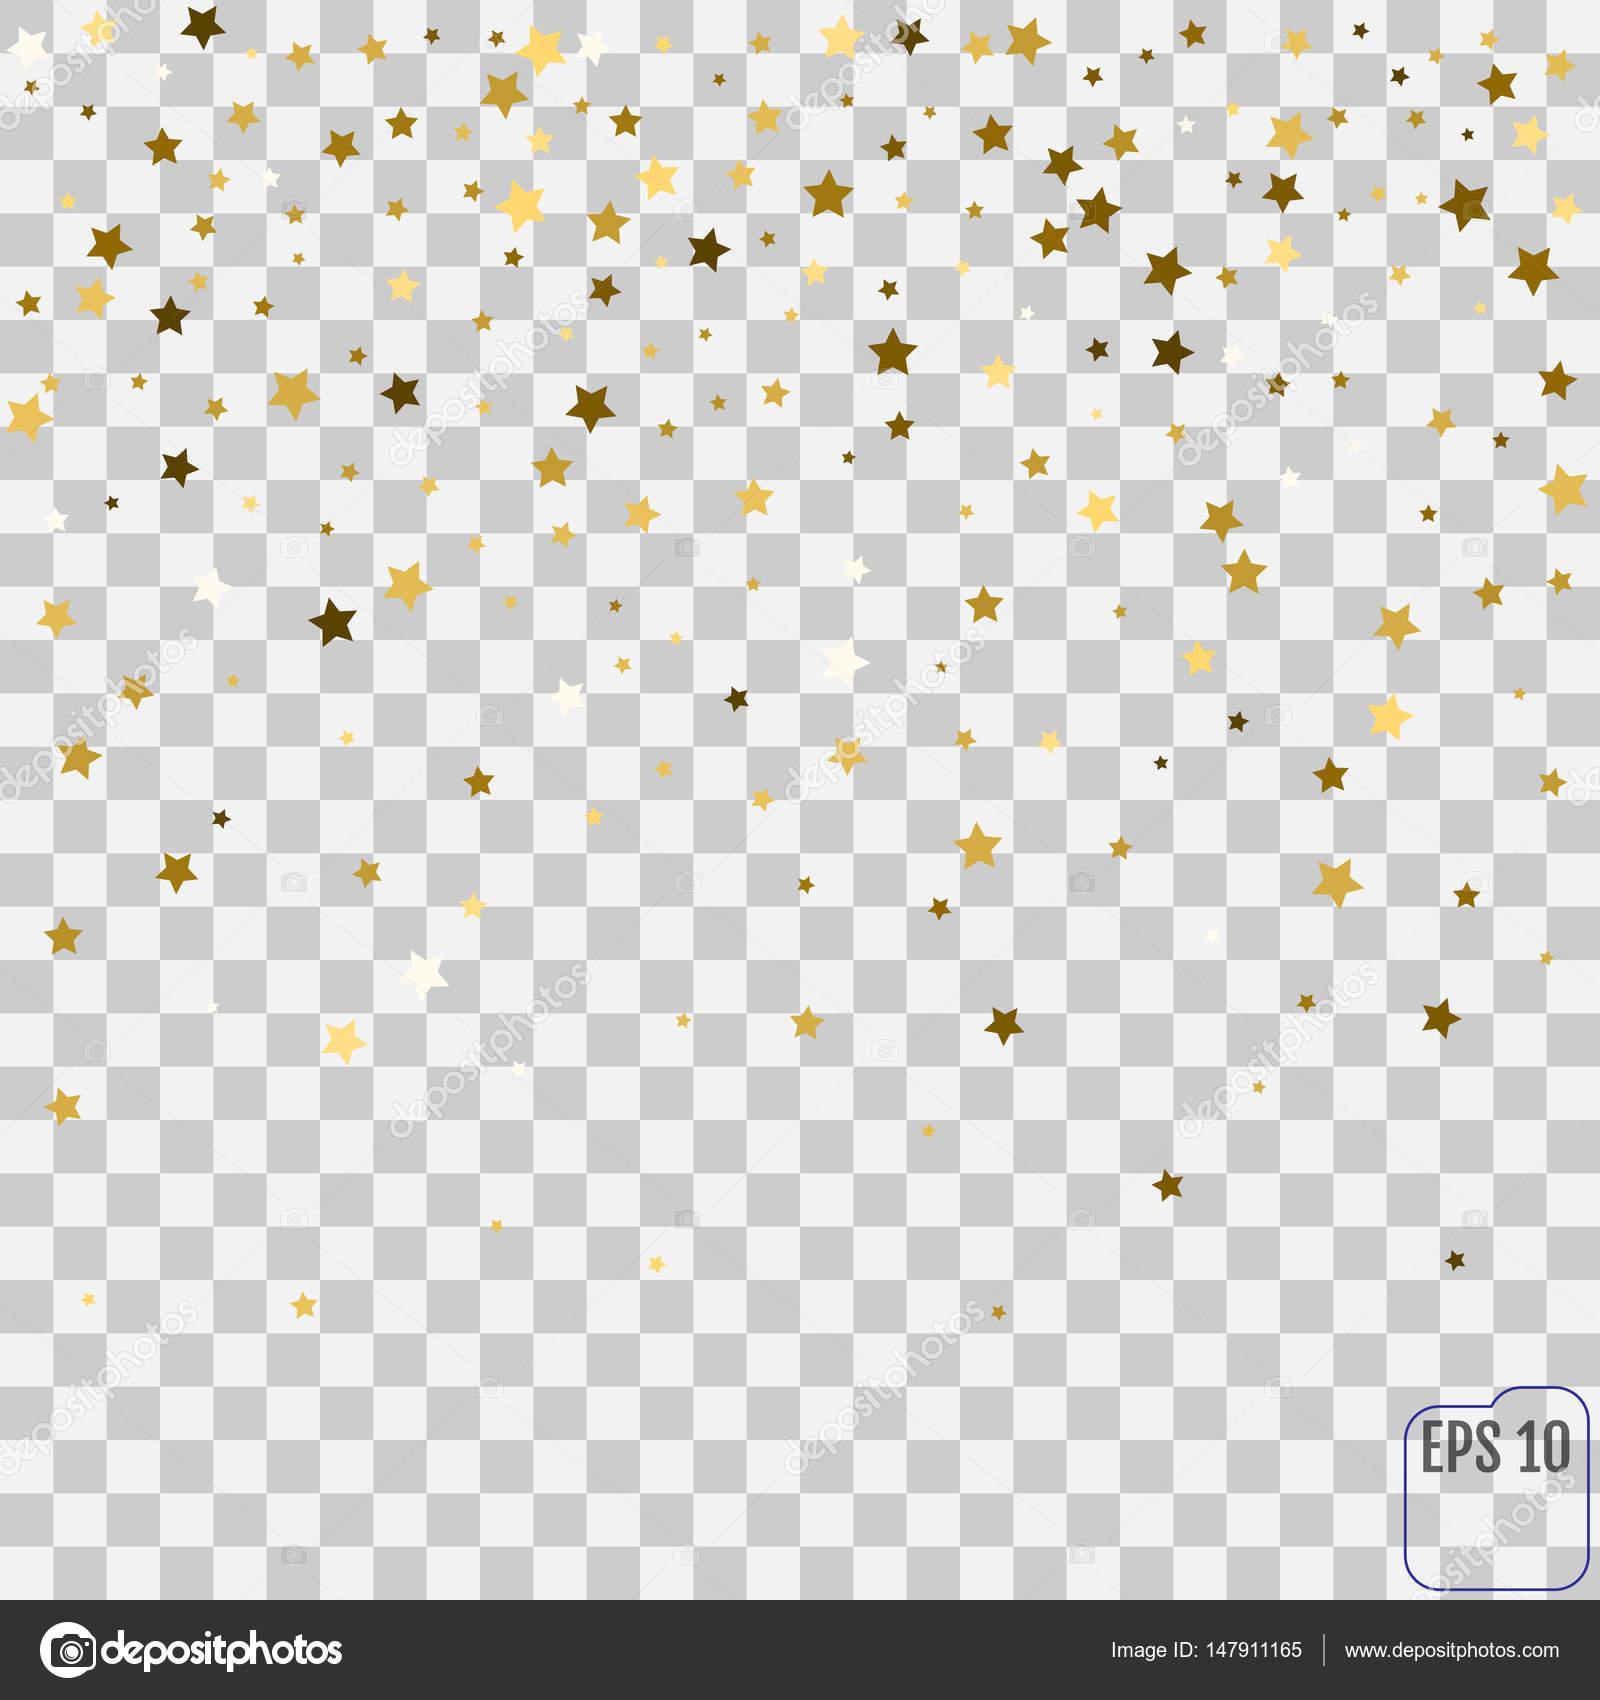 Abstract pattern of random falling golden stars on